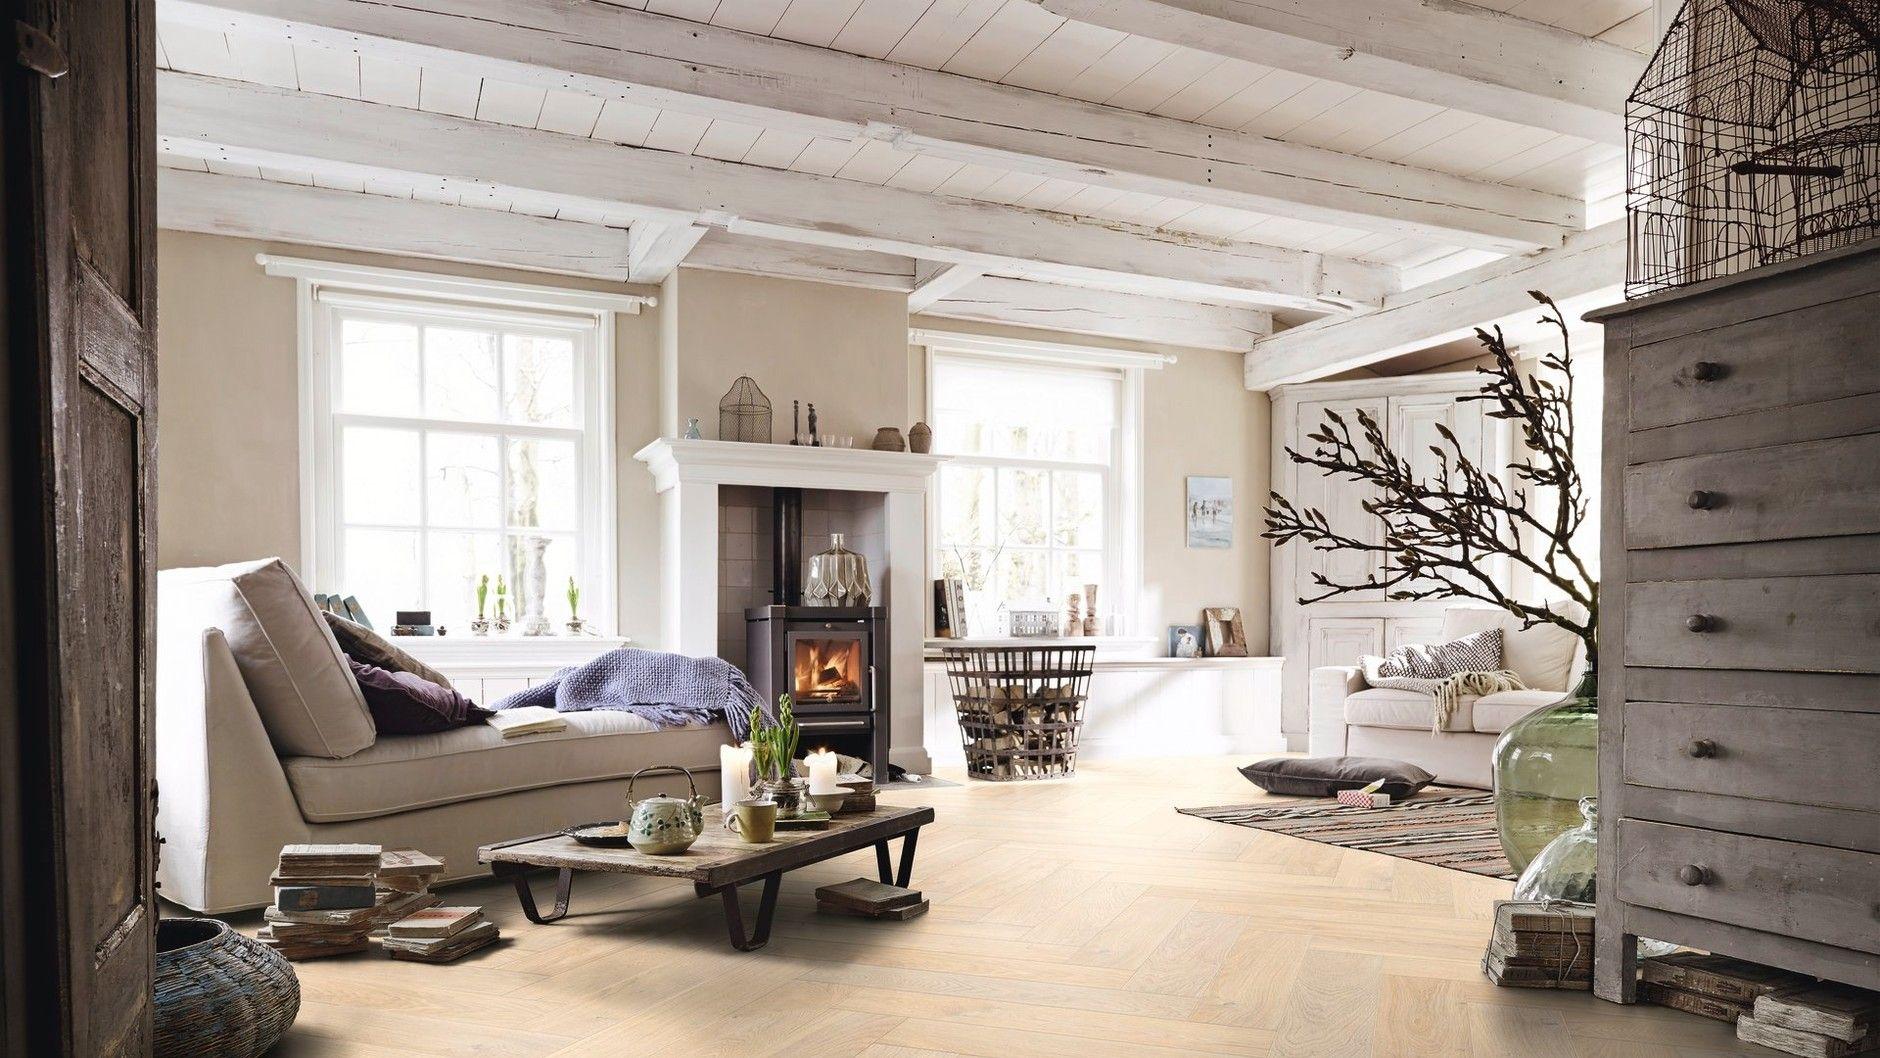 meister lindura houten vloeren houten vloeren parket gespot